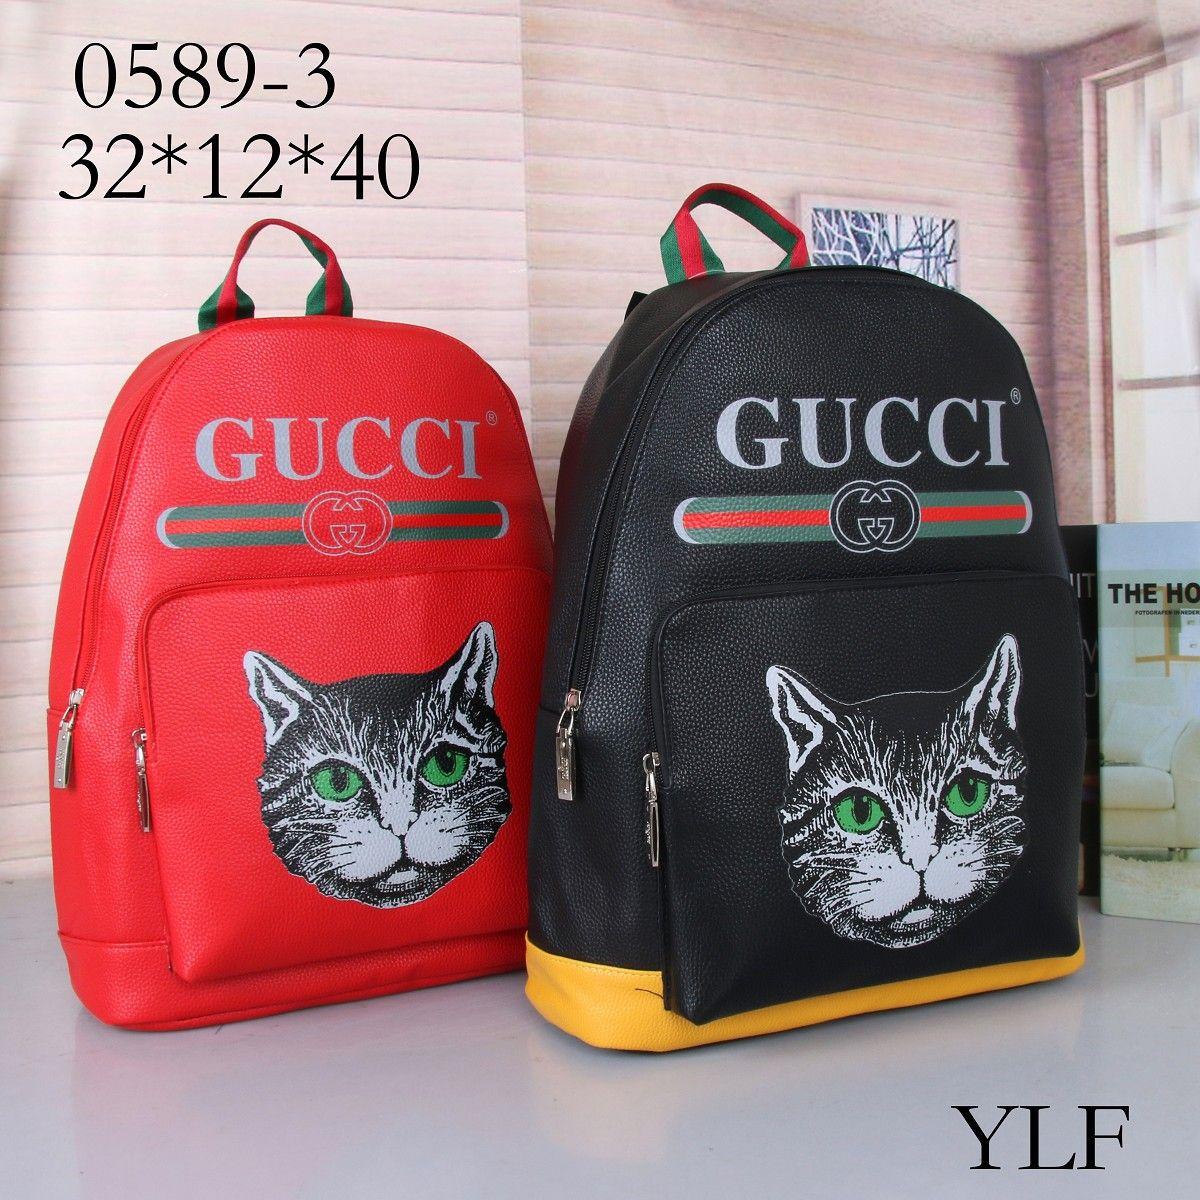 AAA Luxury Backpack Famous Designer Women Men Travel Backpack Casual  Student School Bags Teenagers High Quality Cute Shoulder Bags Swissgear  Backpack Swiss ... 6410c0ac9d92d